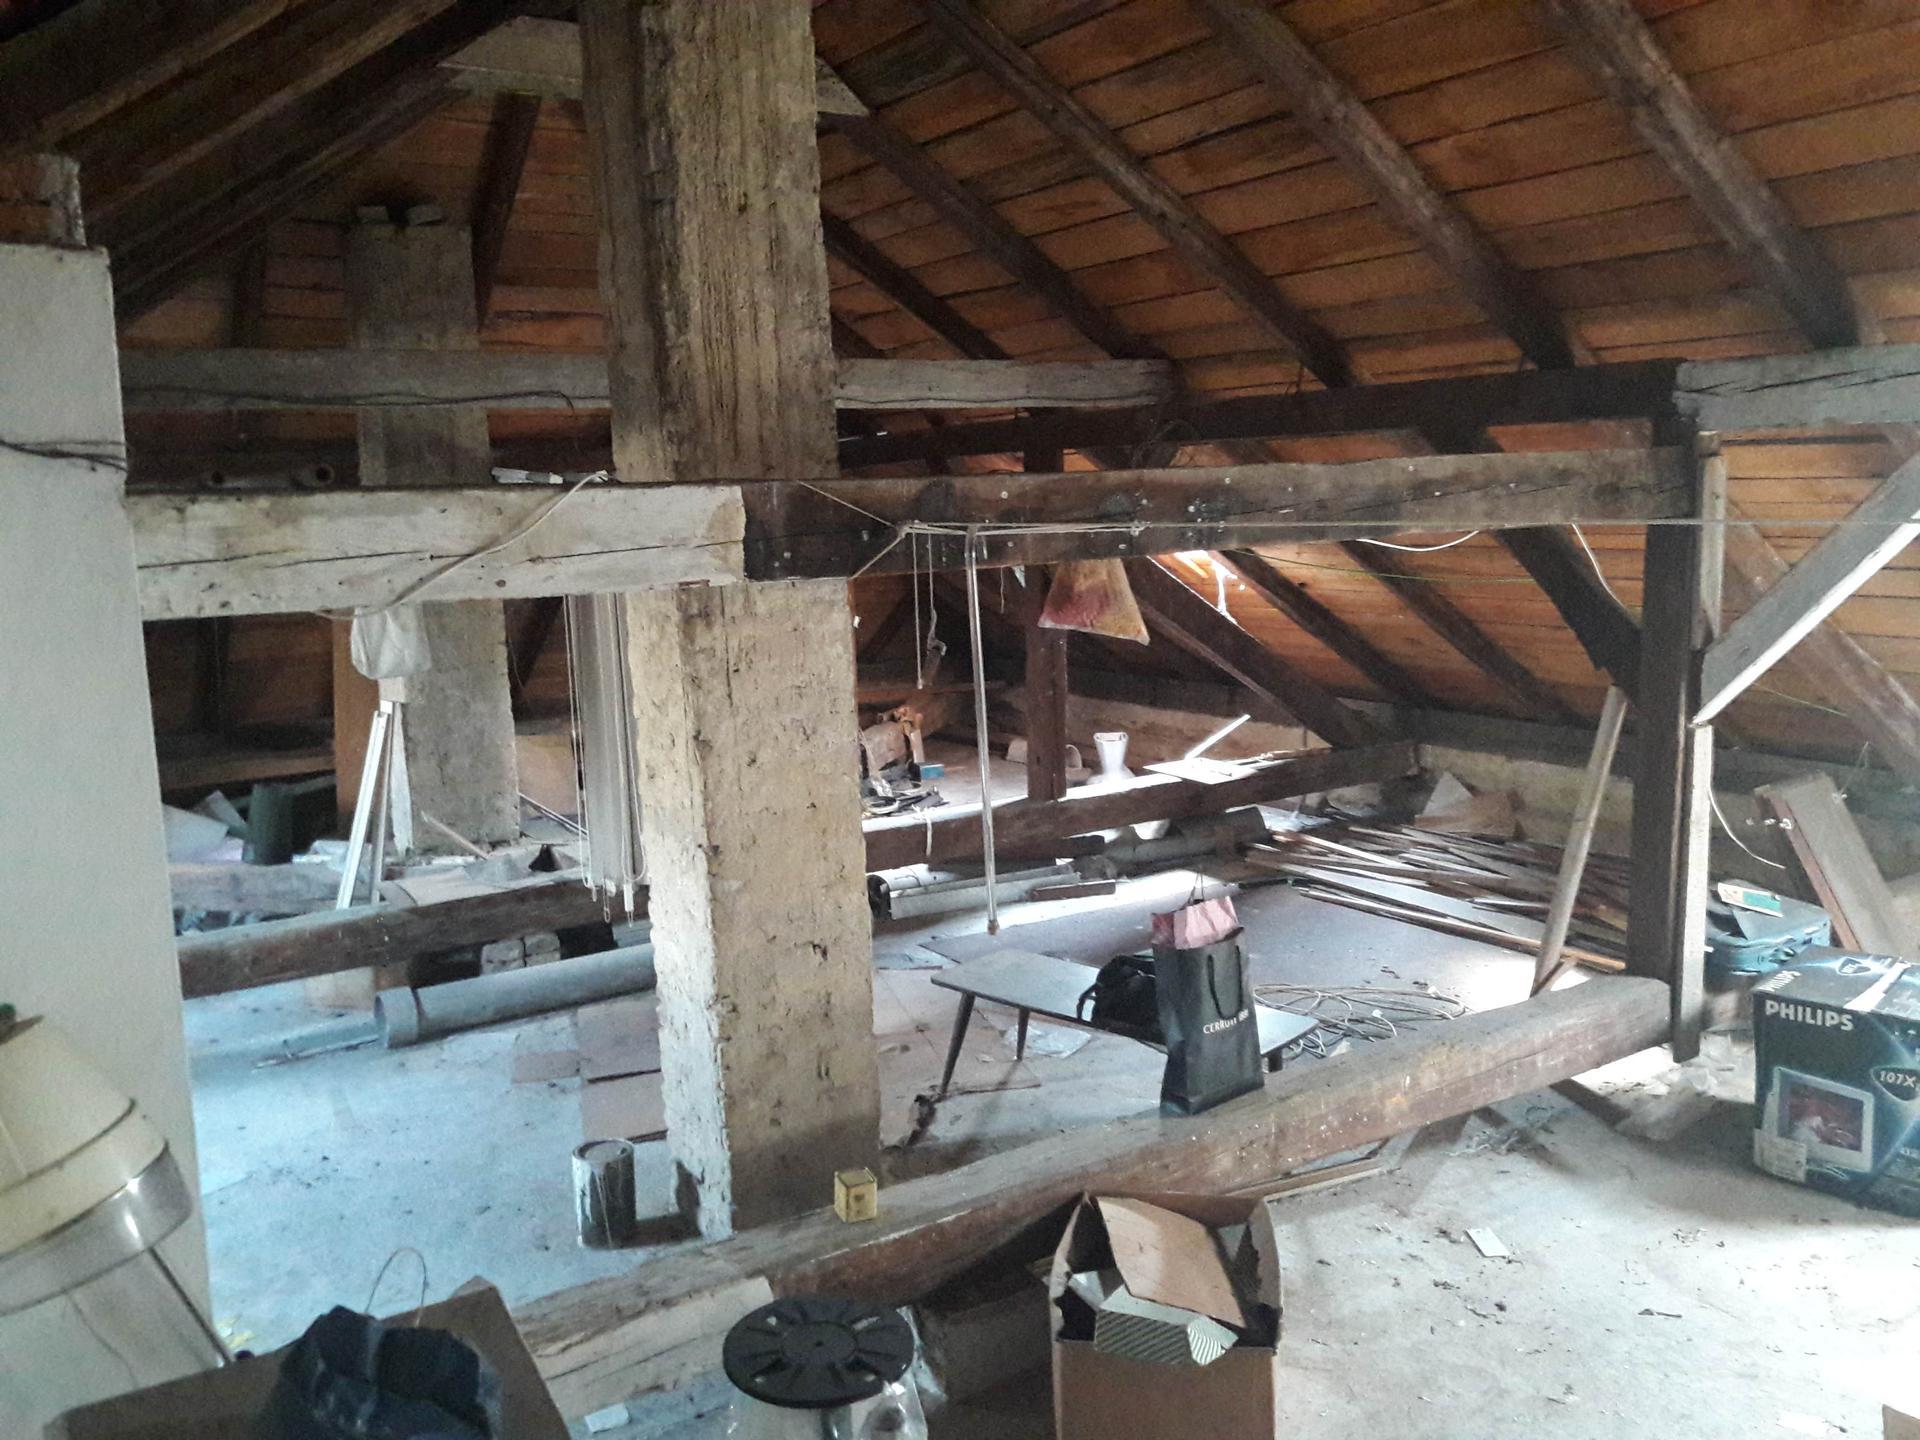 Prestavba podkrovia zo sedlovo valbovej na sedlovú strechu. - Obrázok č. 3